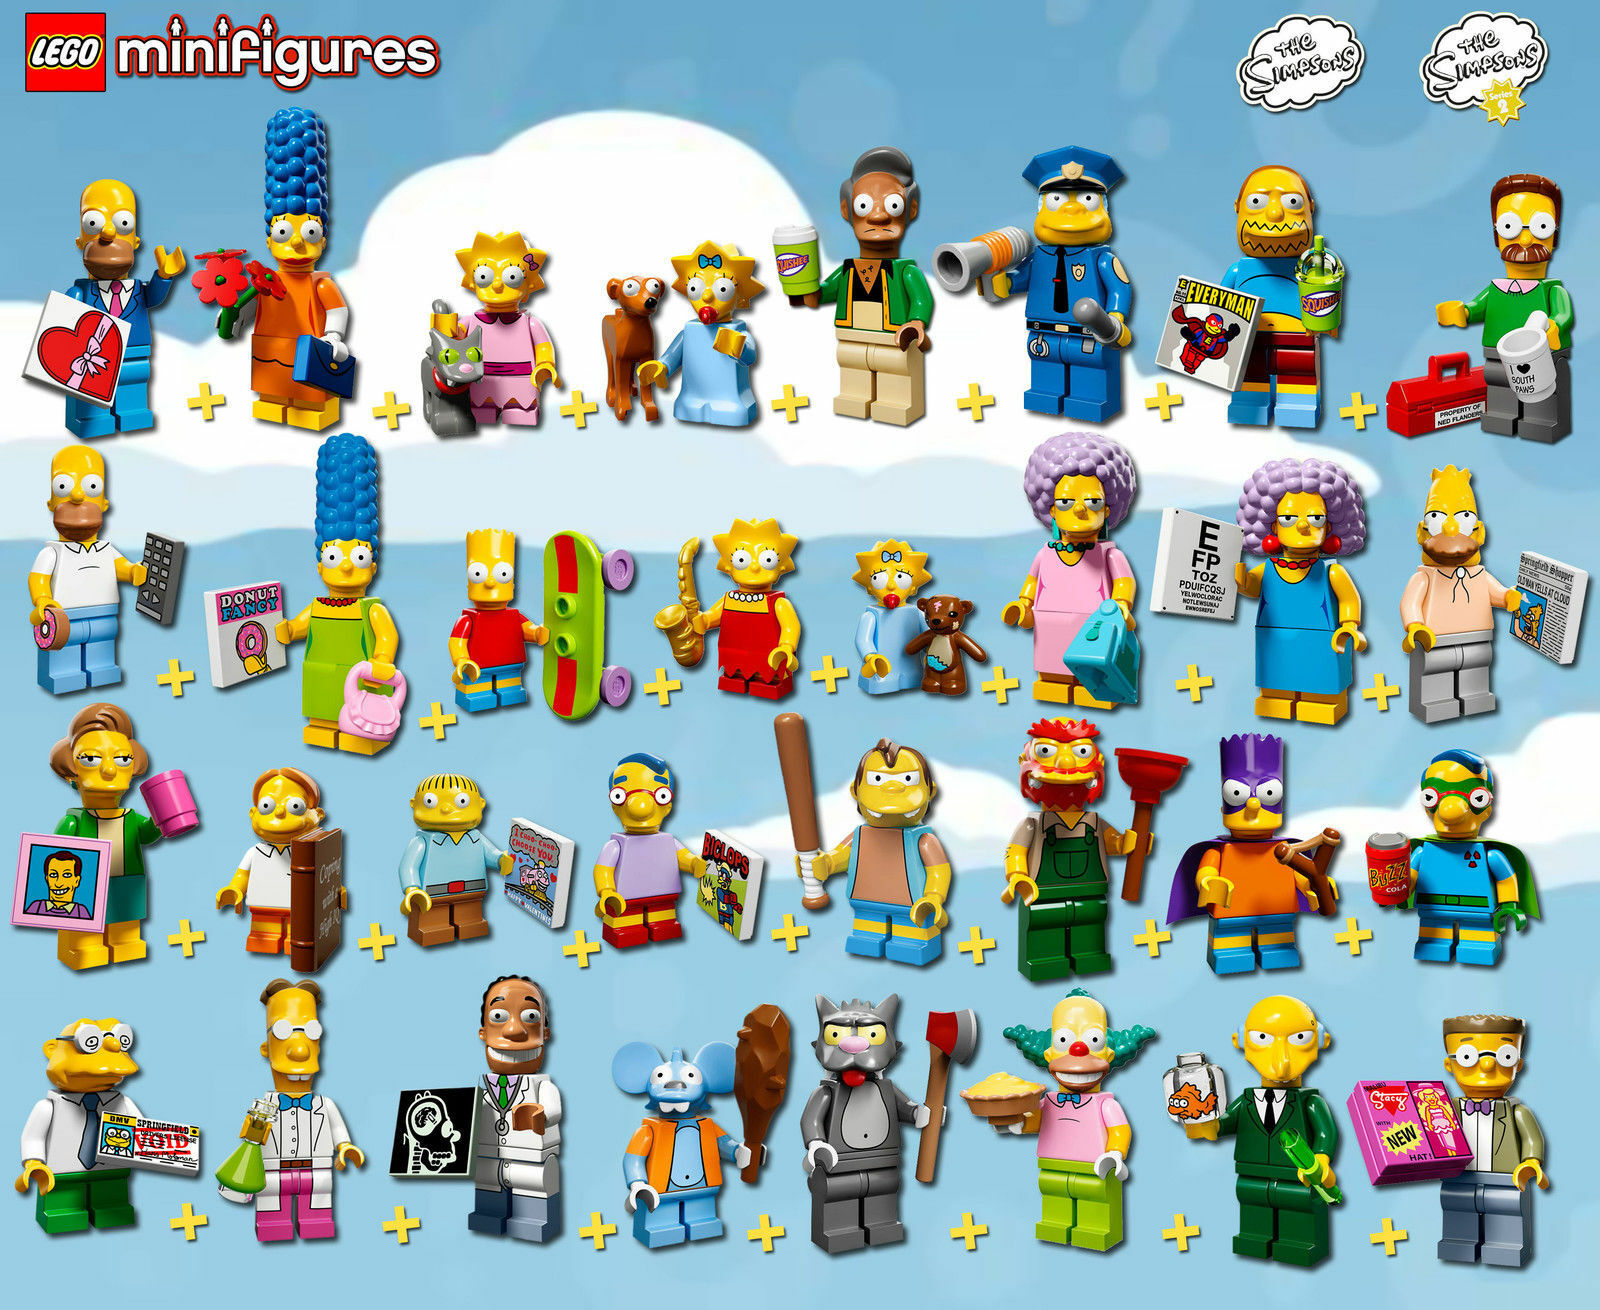 LEGO Simpsons Minifigures  71005 +  71009 - Complete Series 1 + 2 - 100% NEW